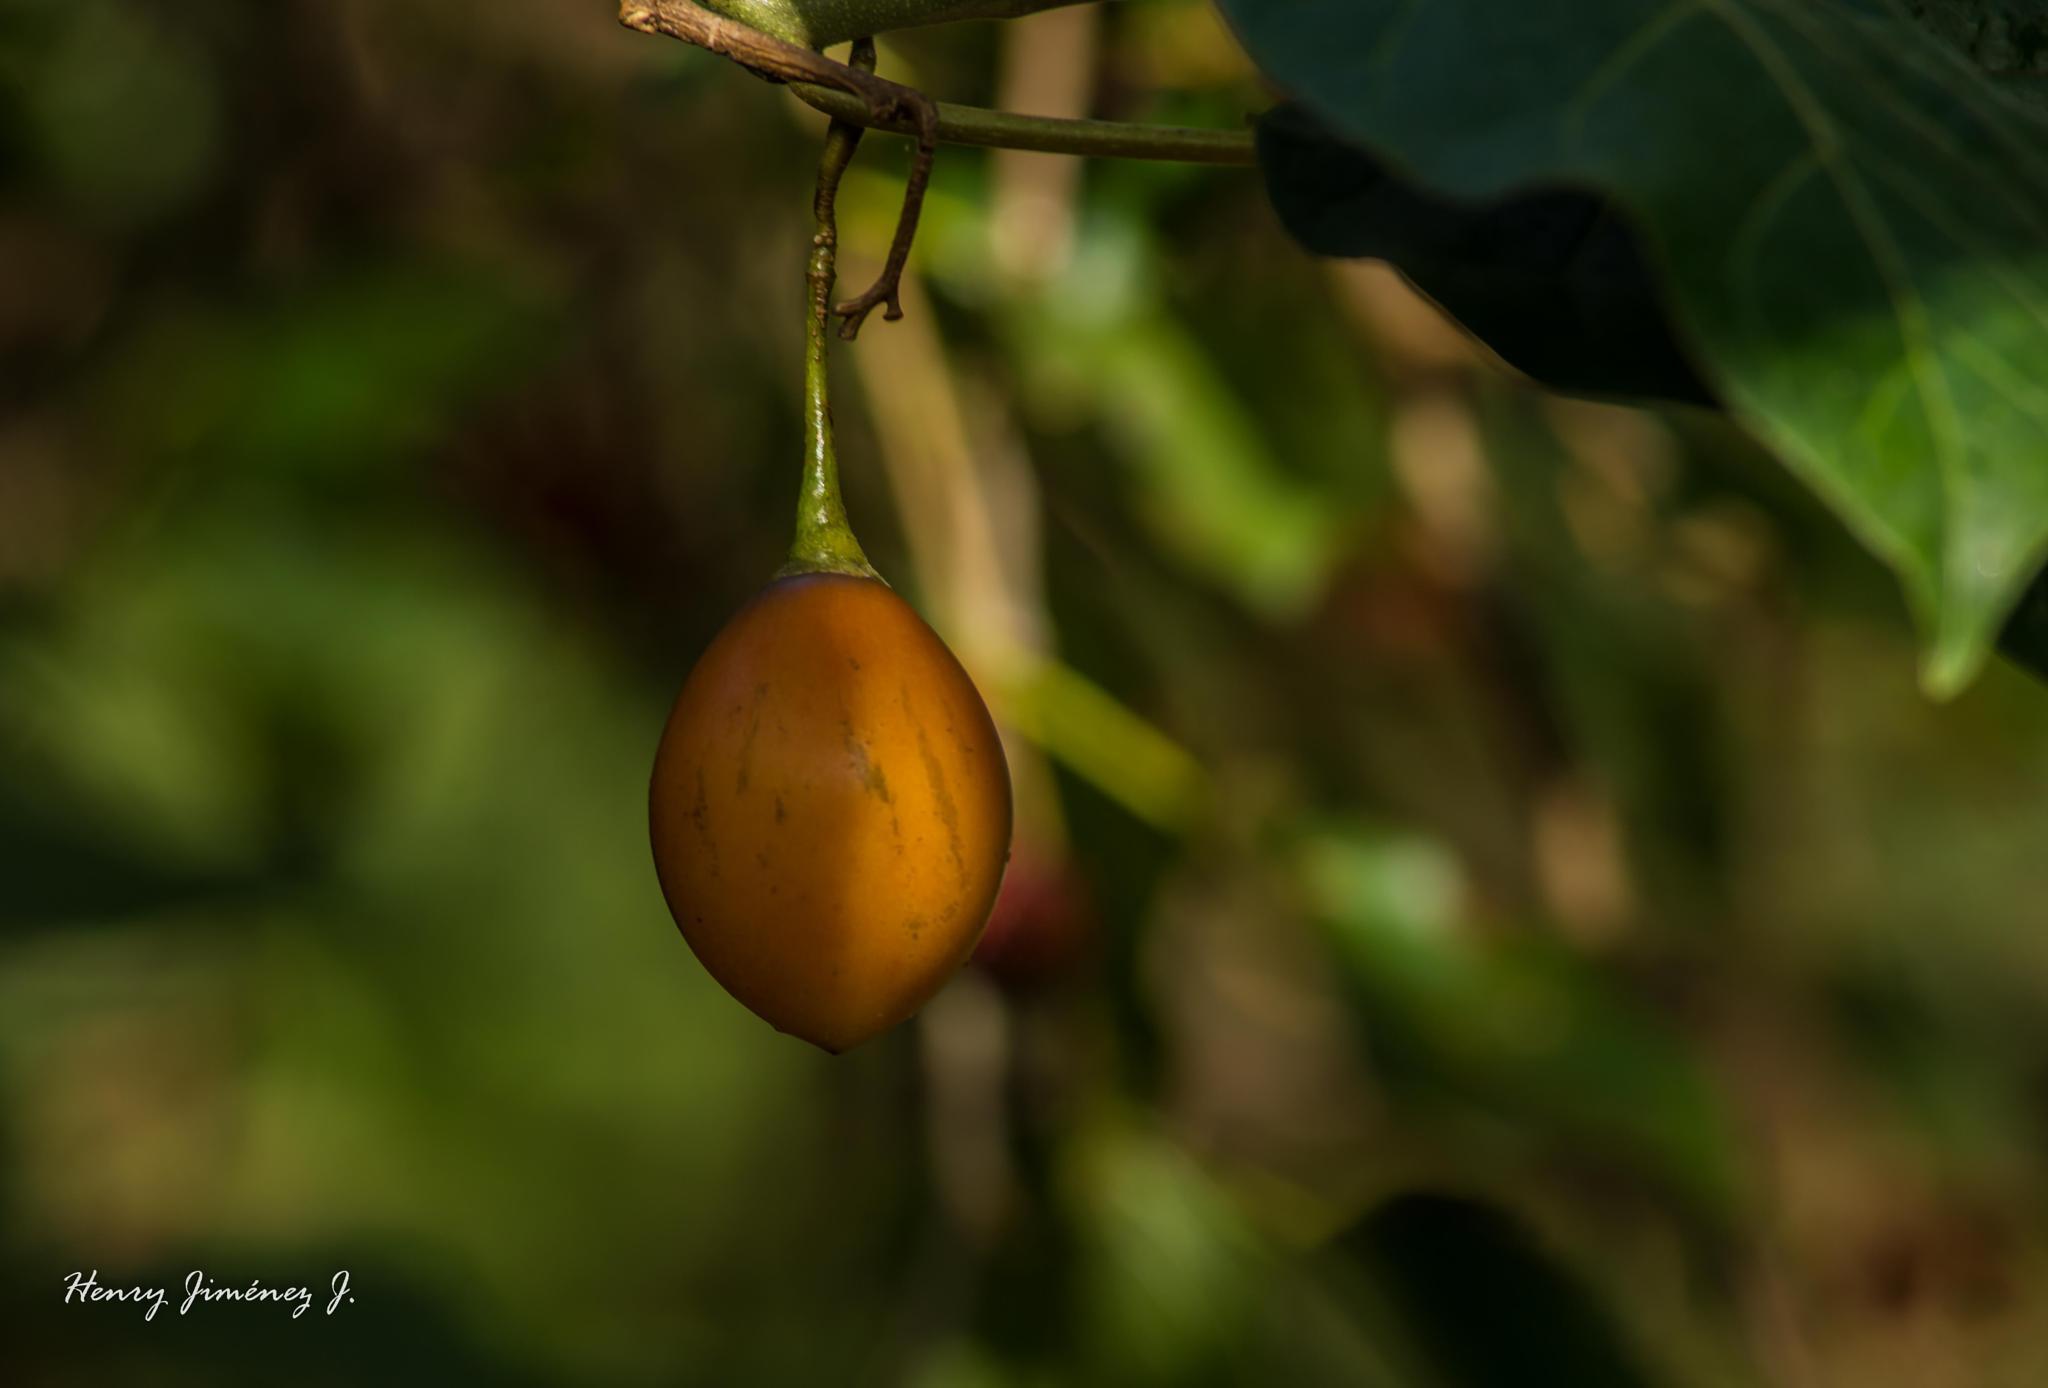 Tomate de árbol. by Henry Jiménez J